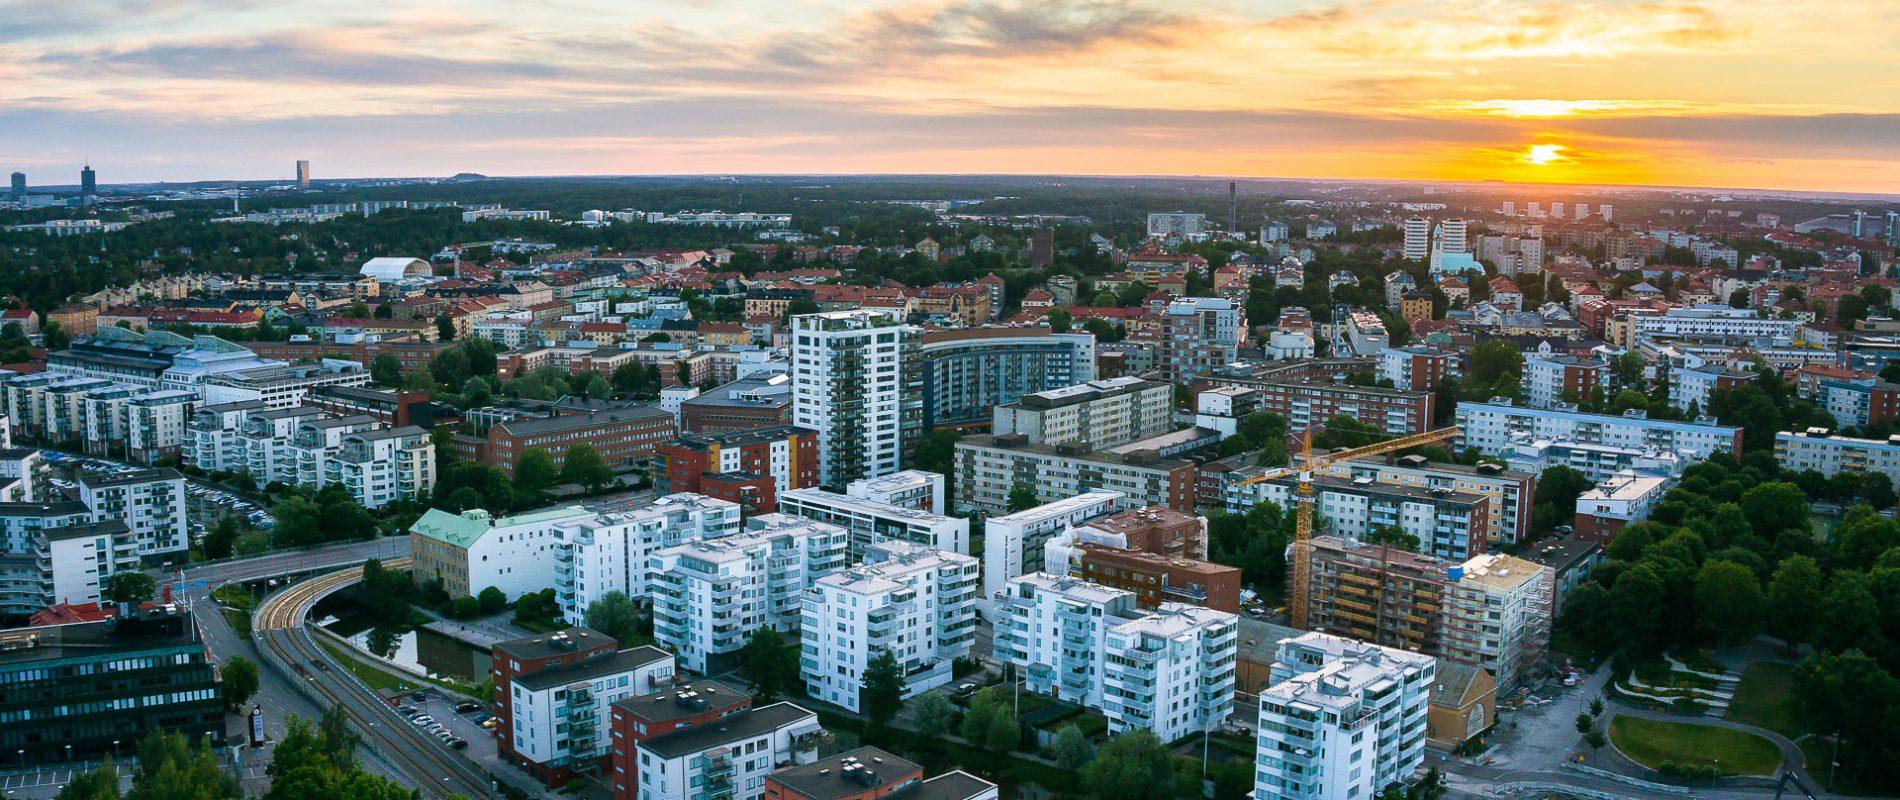 Drönarbild av flerbostadshus i Stockholm